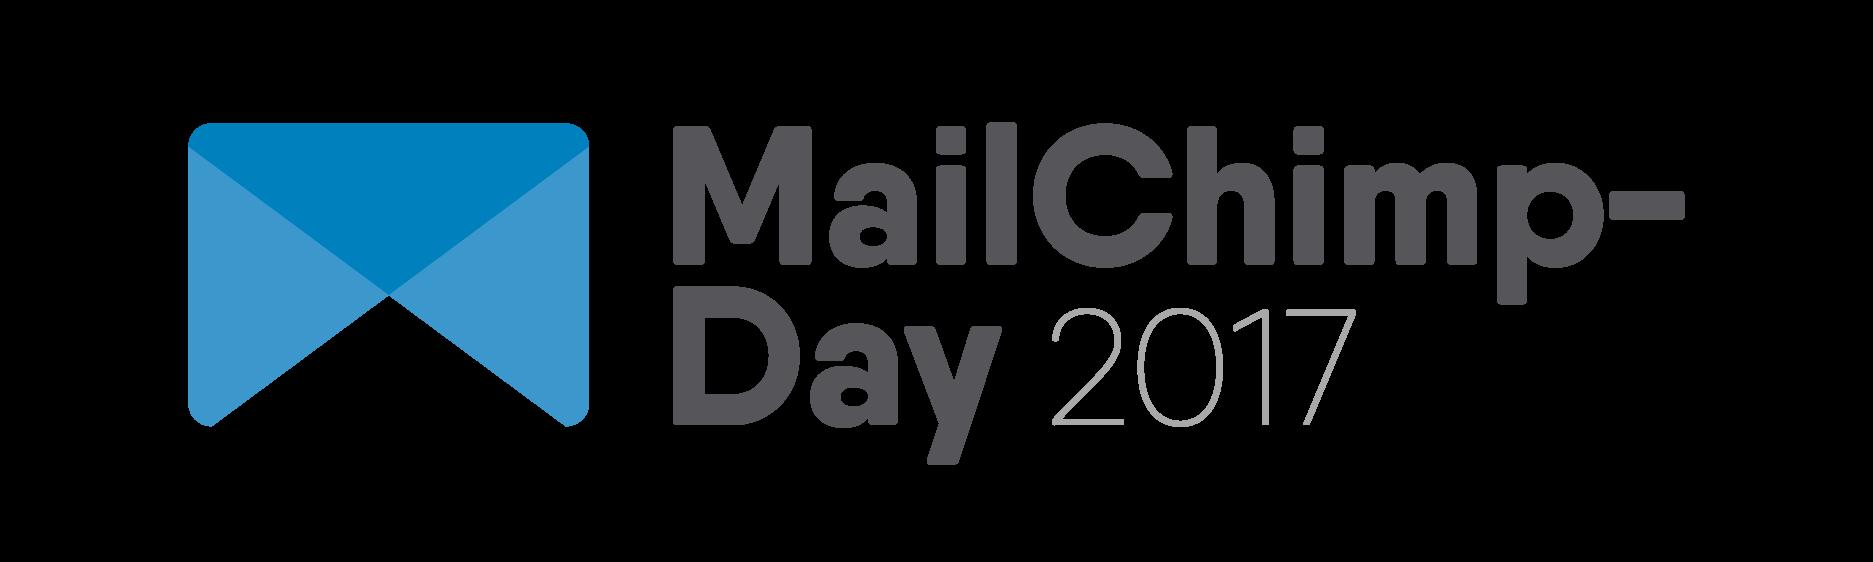 mailchimp-day_2017_logo